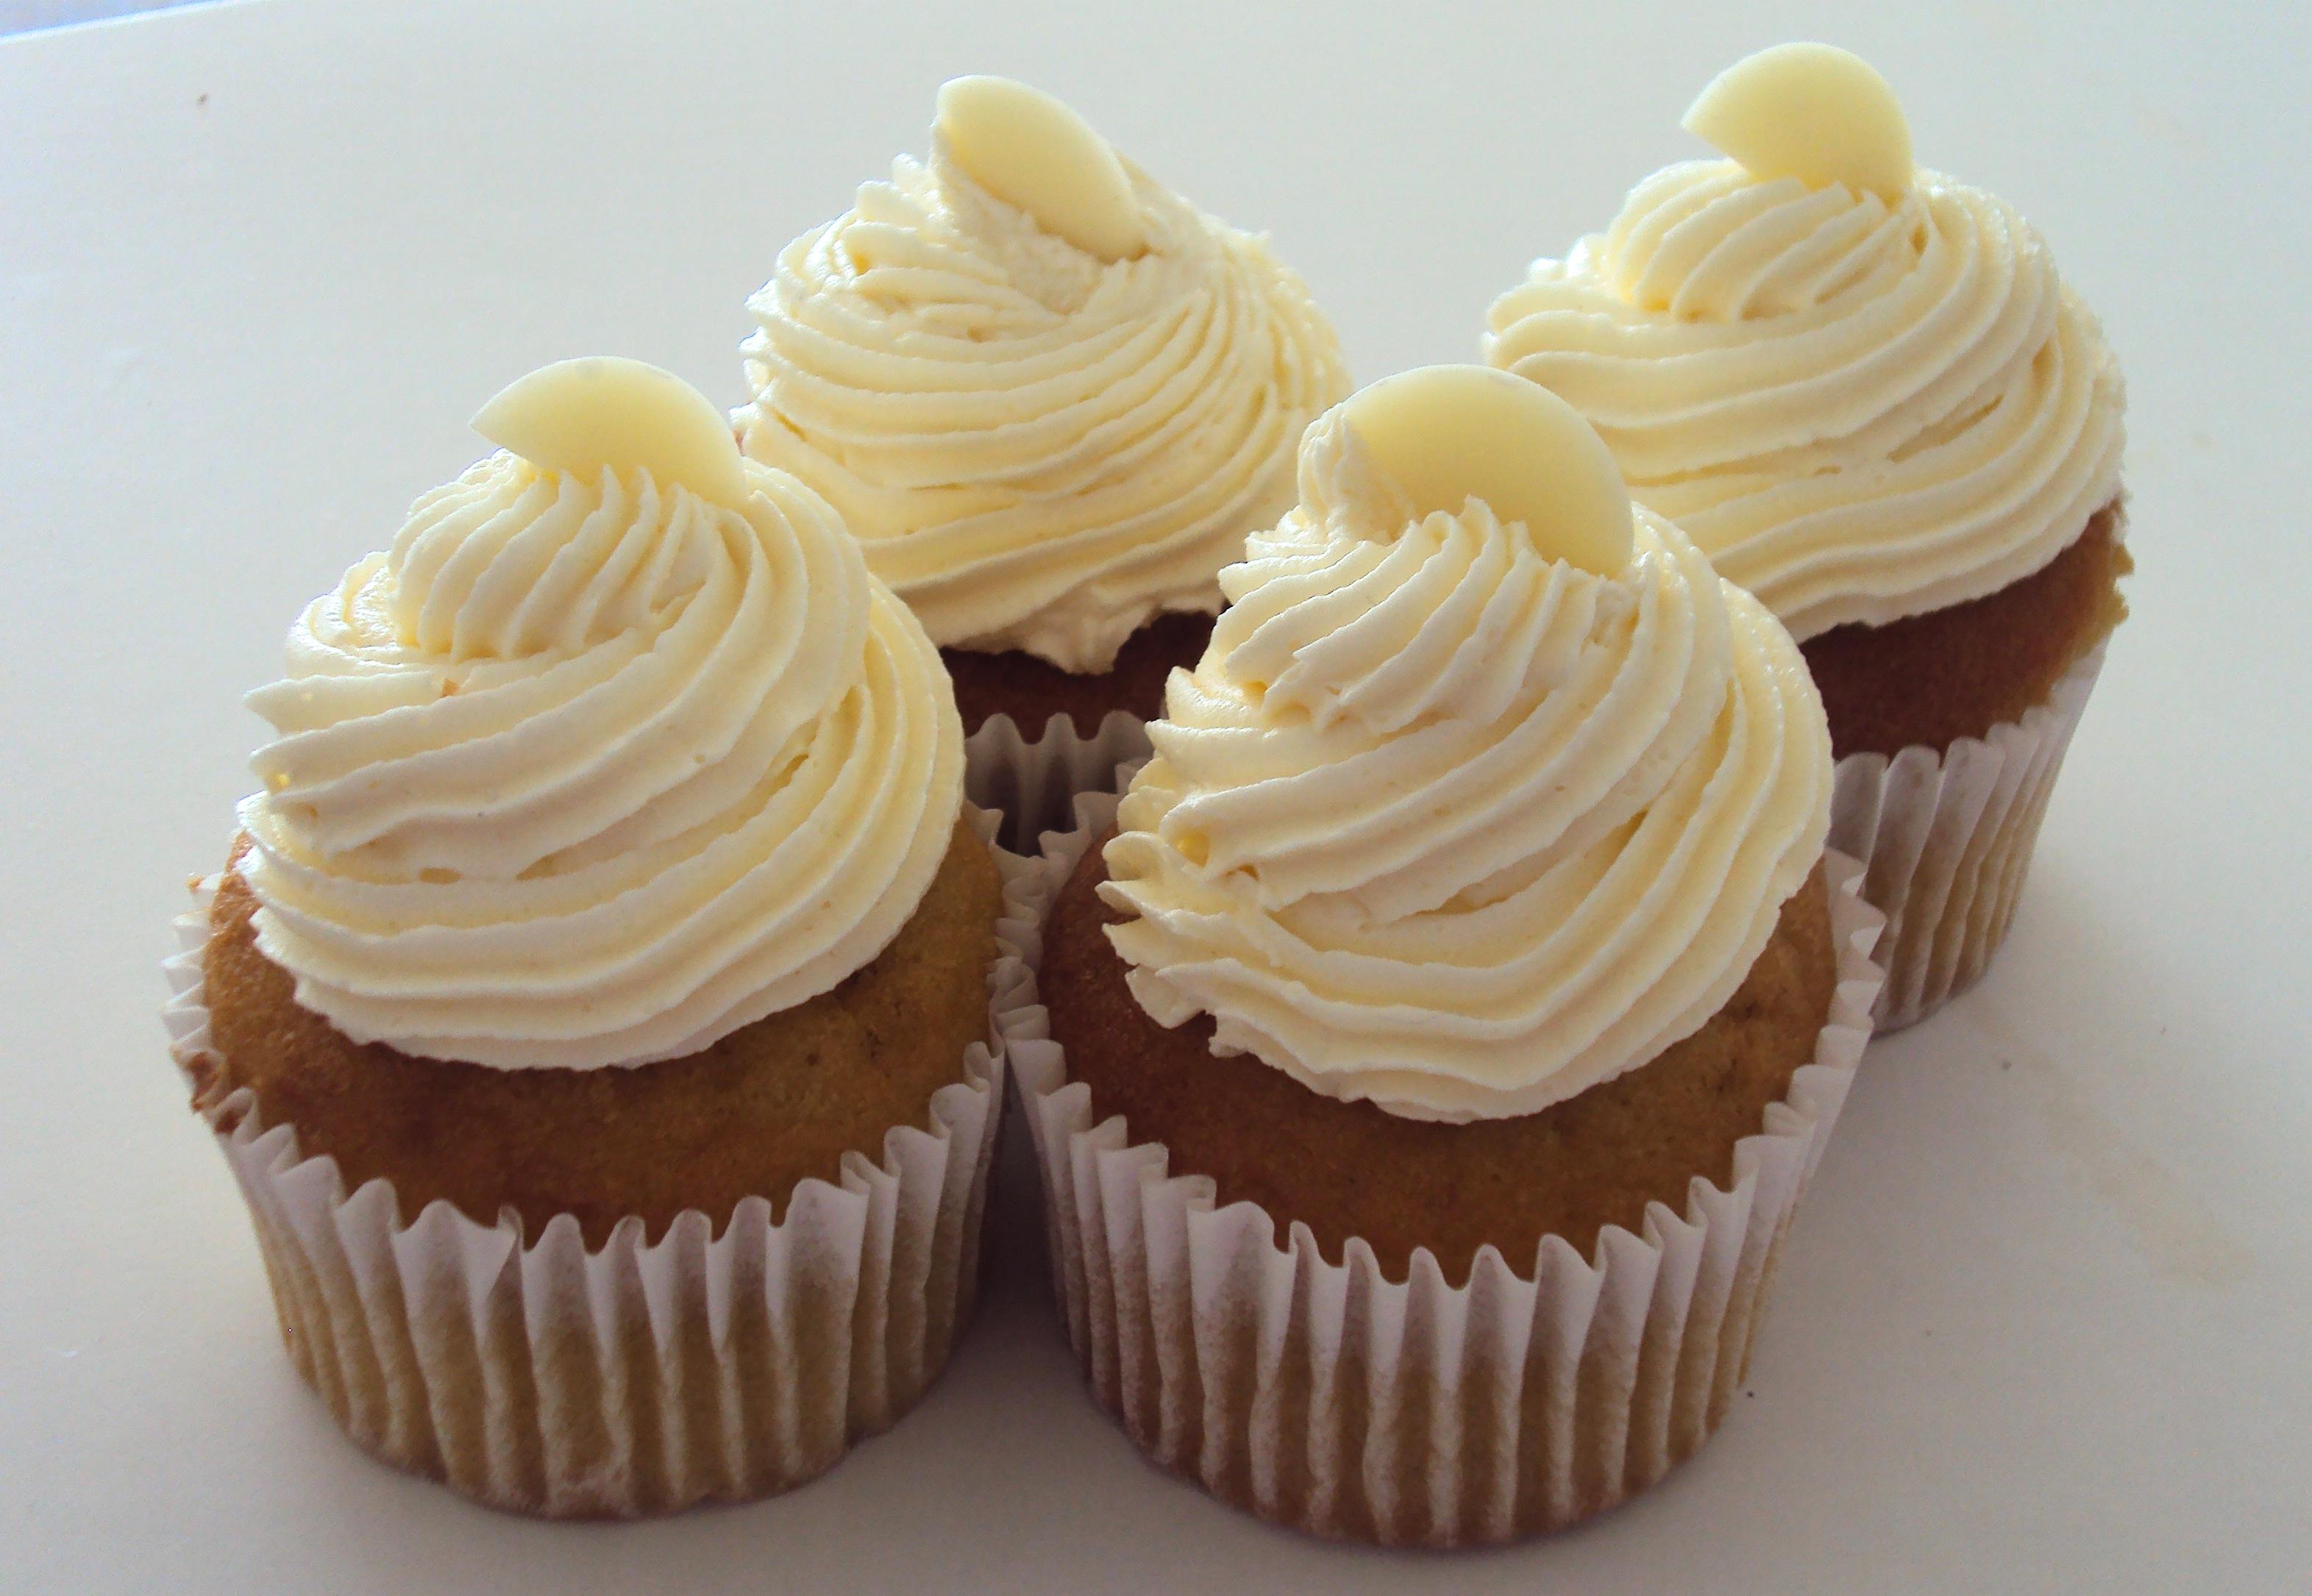 Vanilla Bean Cupcakes (per dozen) · Sugary Goodness · Online Store ...